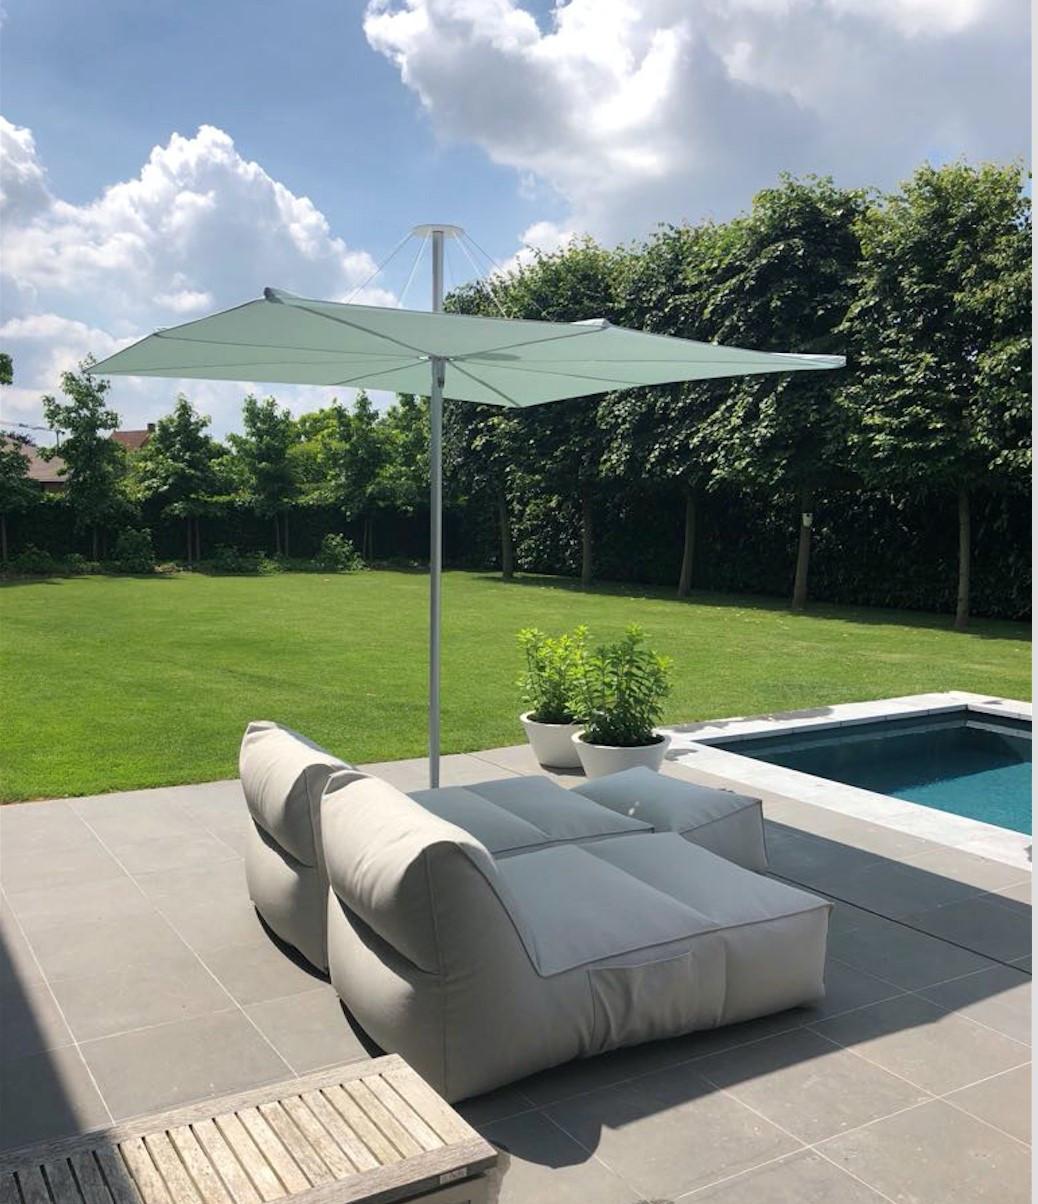 Infina garden parasol residential 6LR.jpg